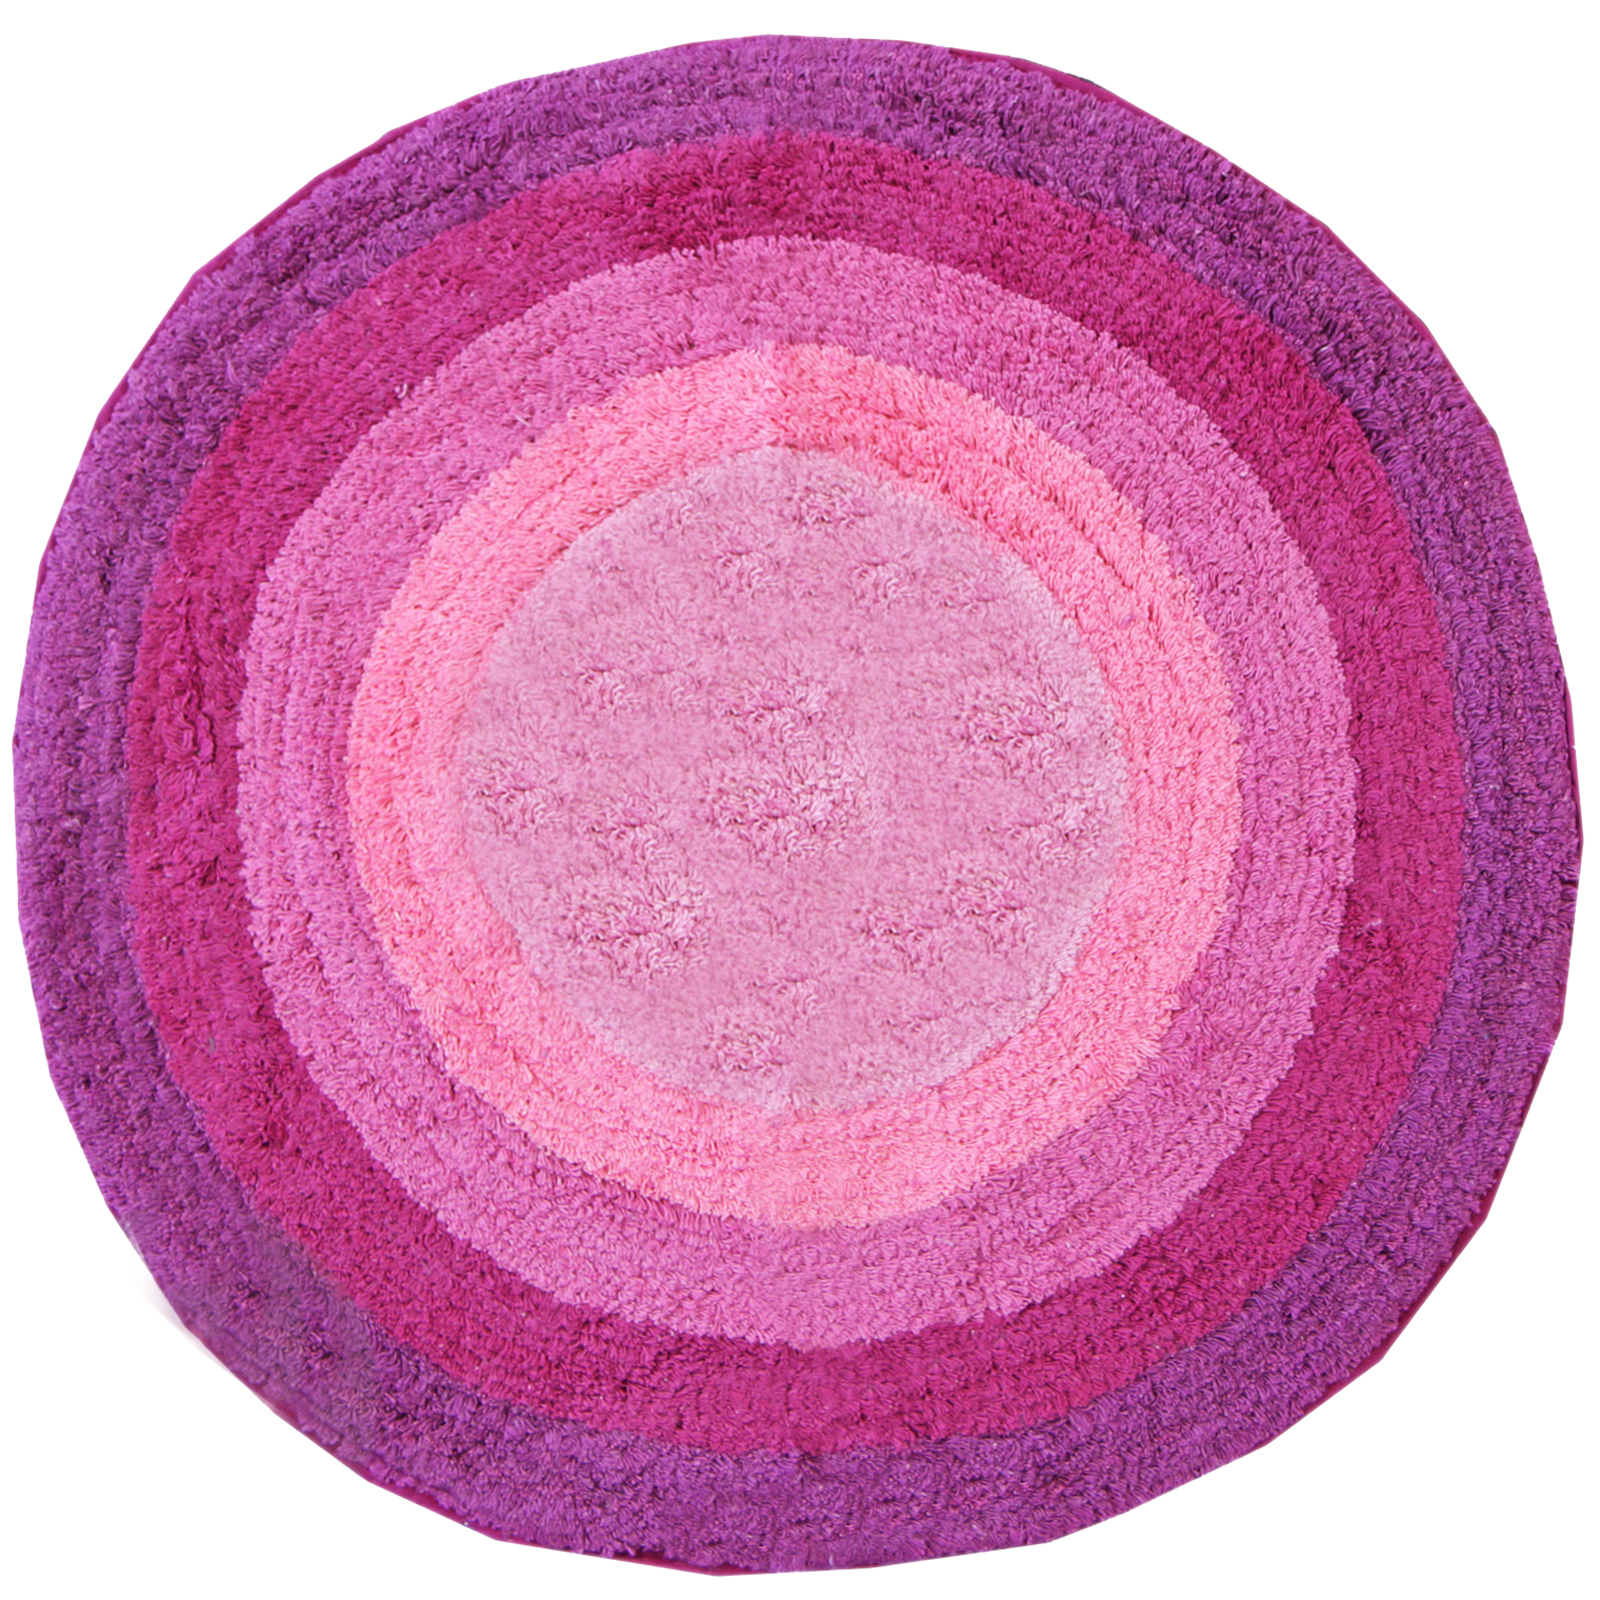 100 Cotton Round Bath Mats Bathroom Washable Mat